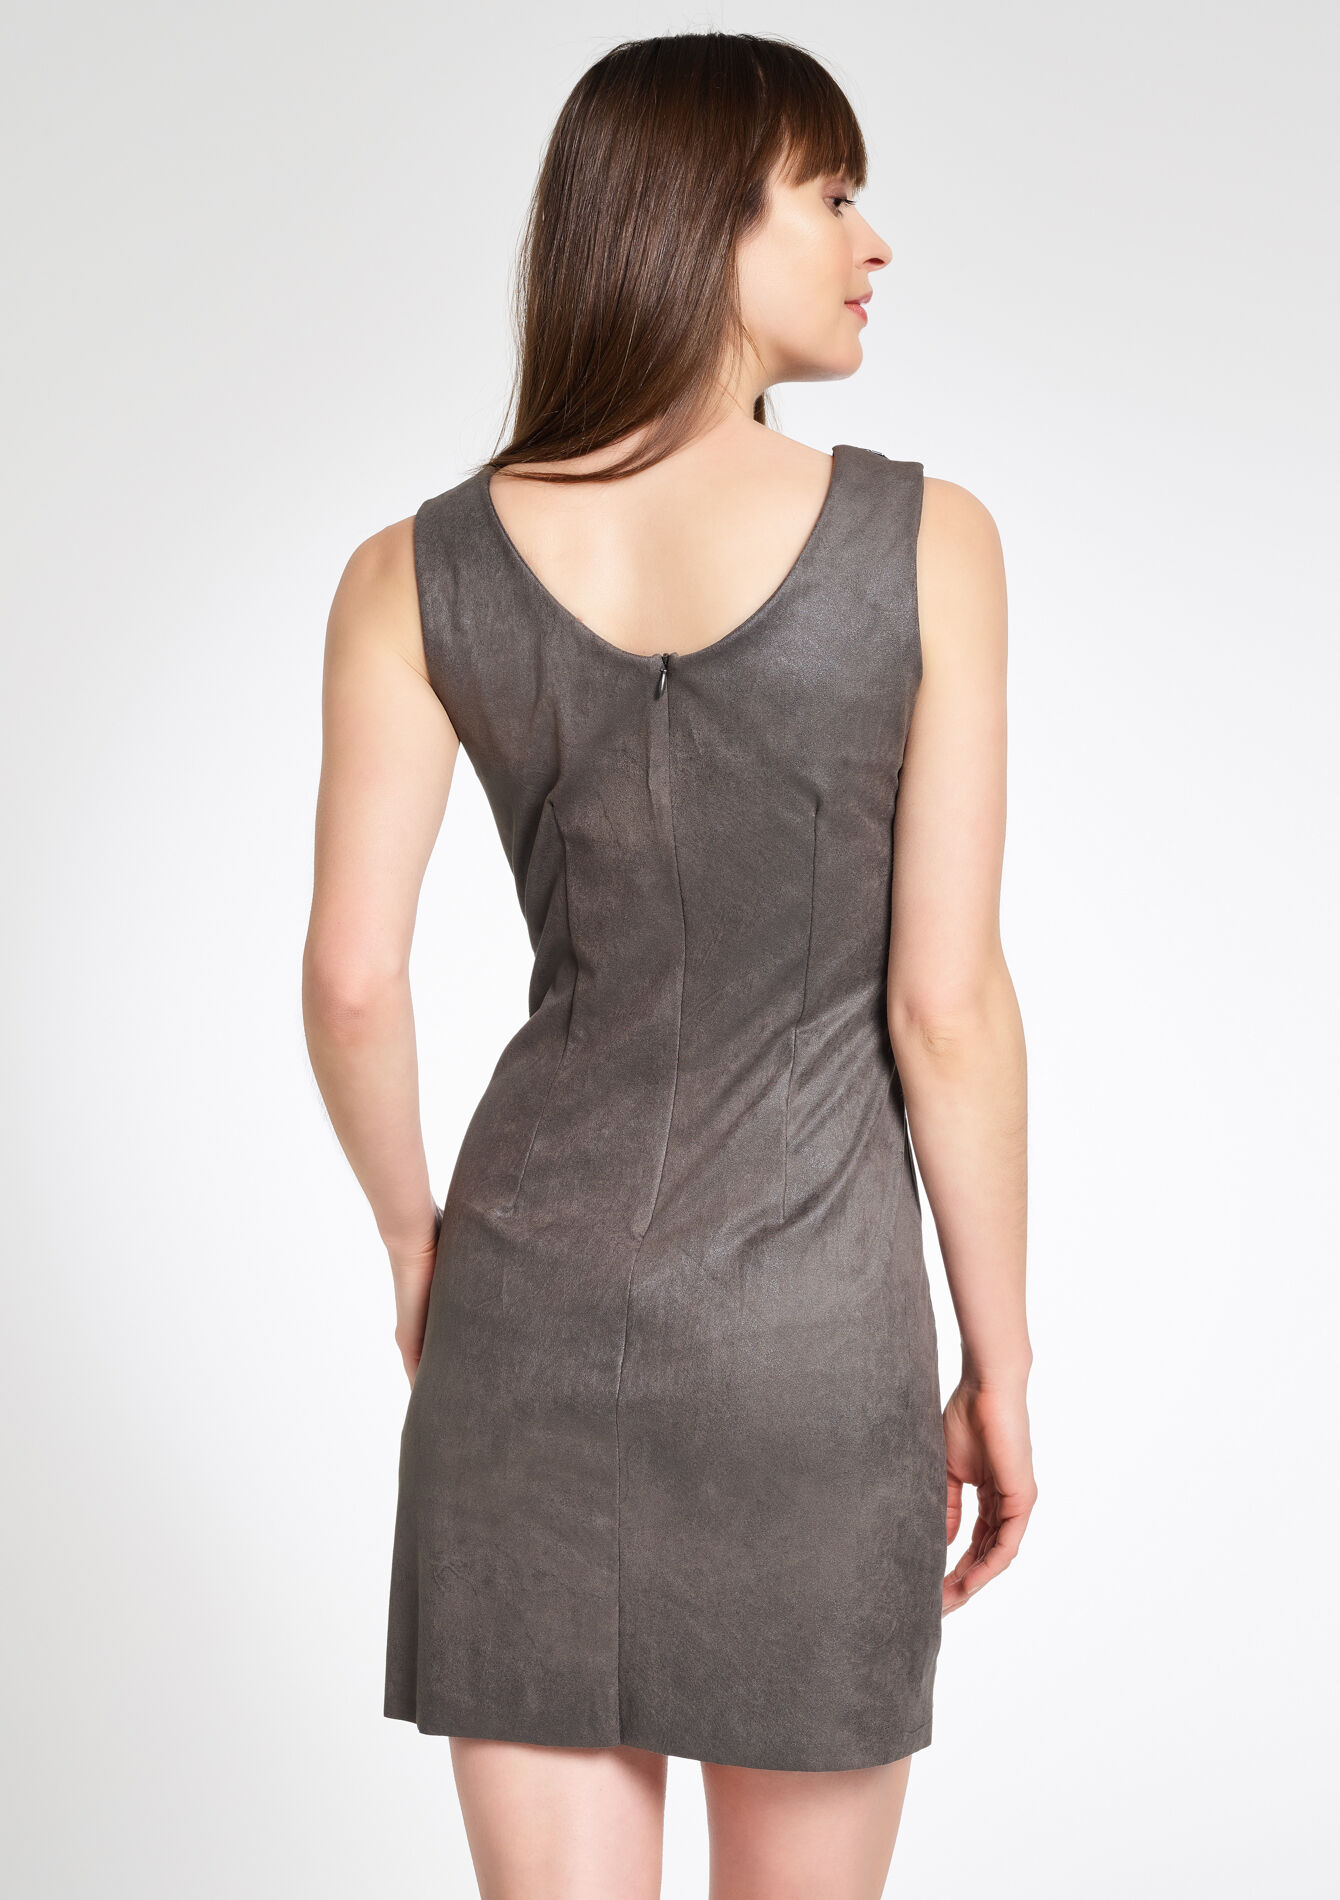 suede jurk mouwloos